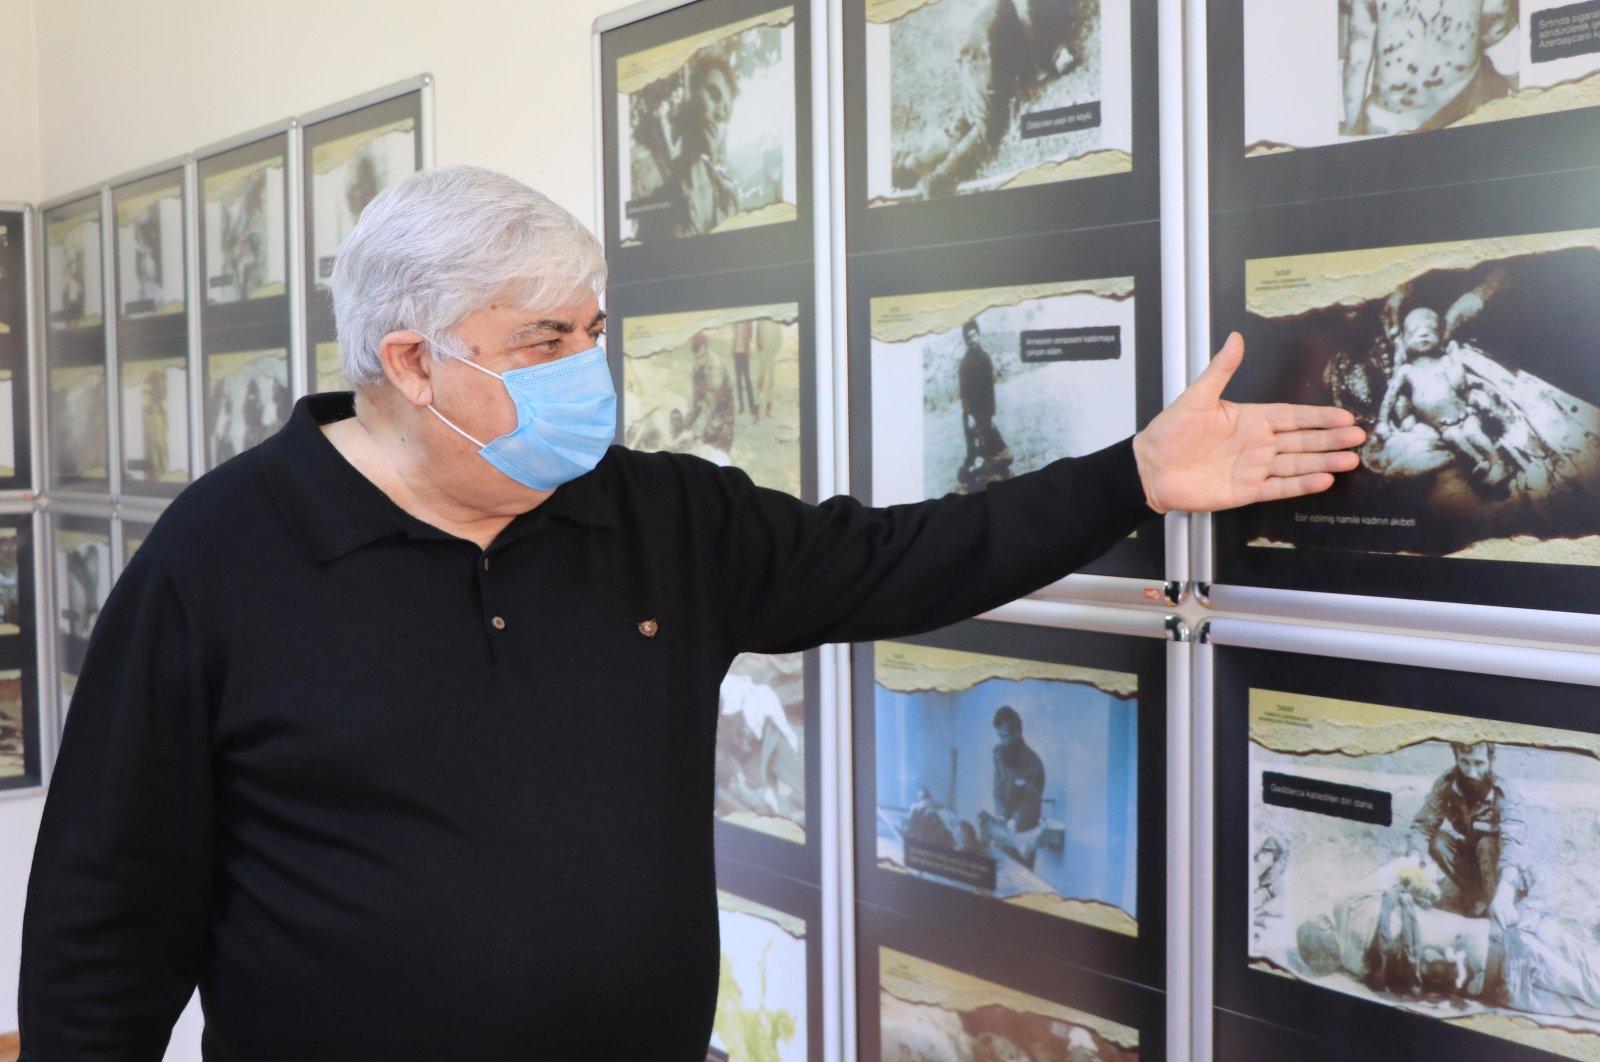 Bilal Dündar, Turkey-Azerbaijan Associations Federation Chair, shows pictures of victims killed by Armenian groups during World War I, in northwestern Turkey's Kocaeli province, April 23, 2021. (AA Photo)